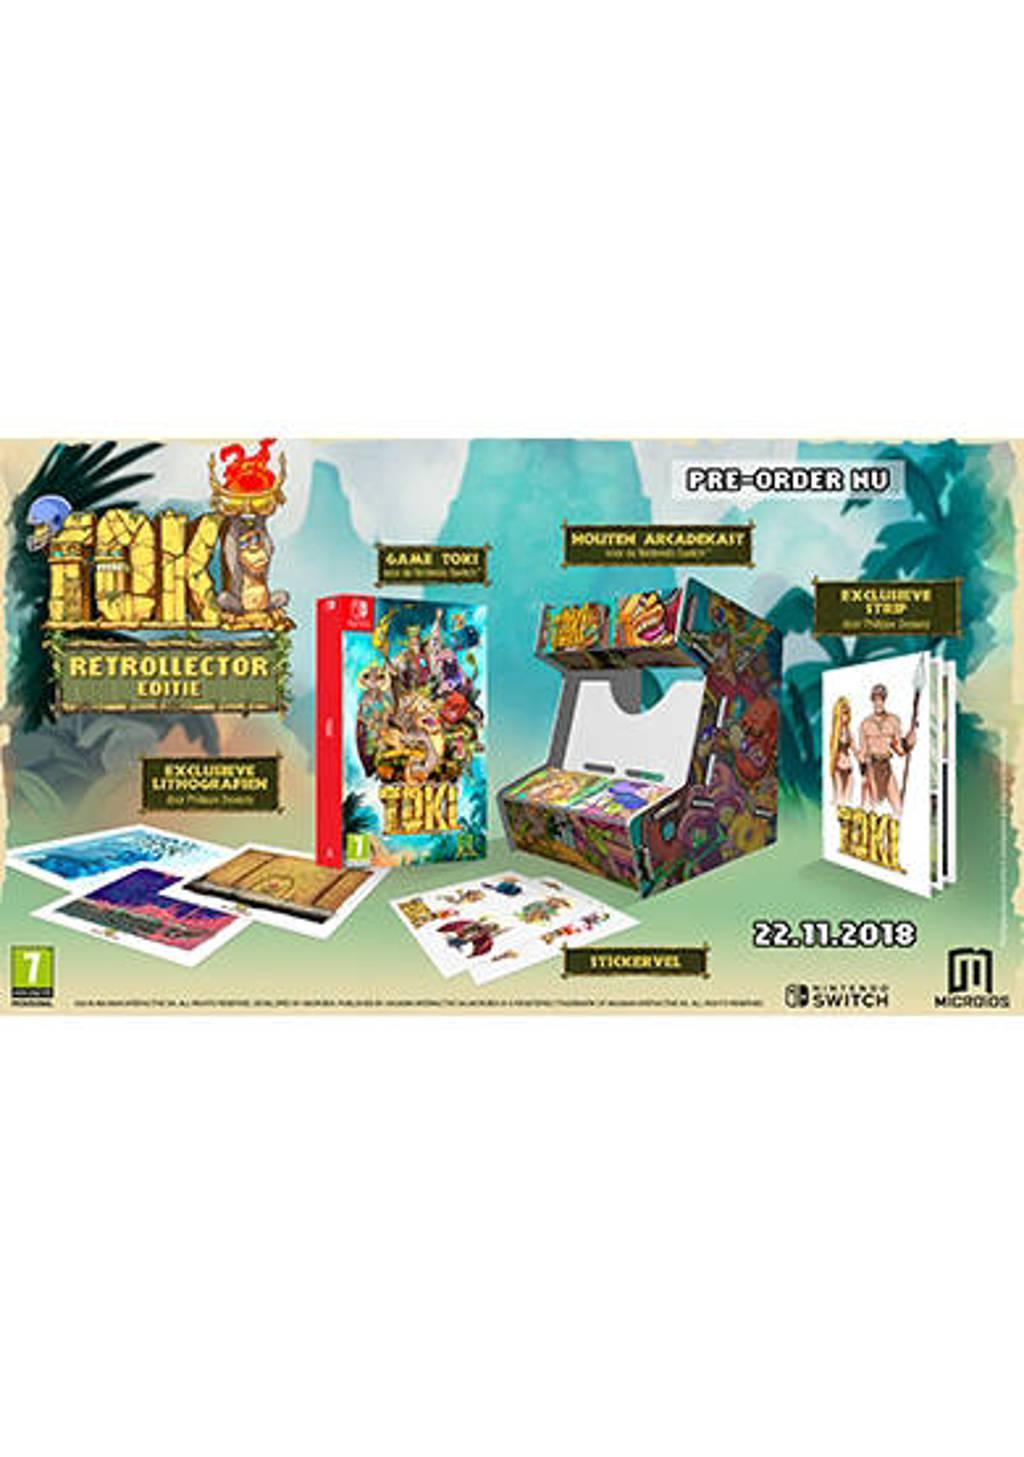 Toki (Retrollector edition) (Nintendo Switch)